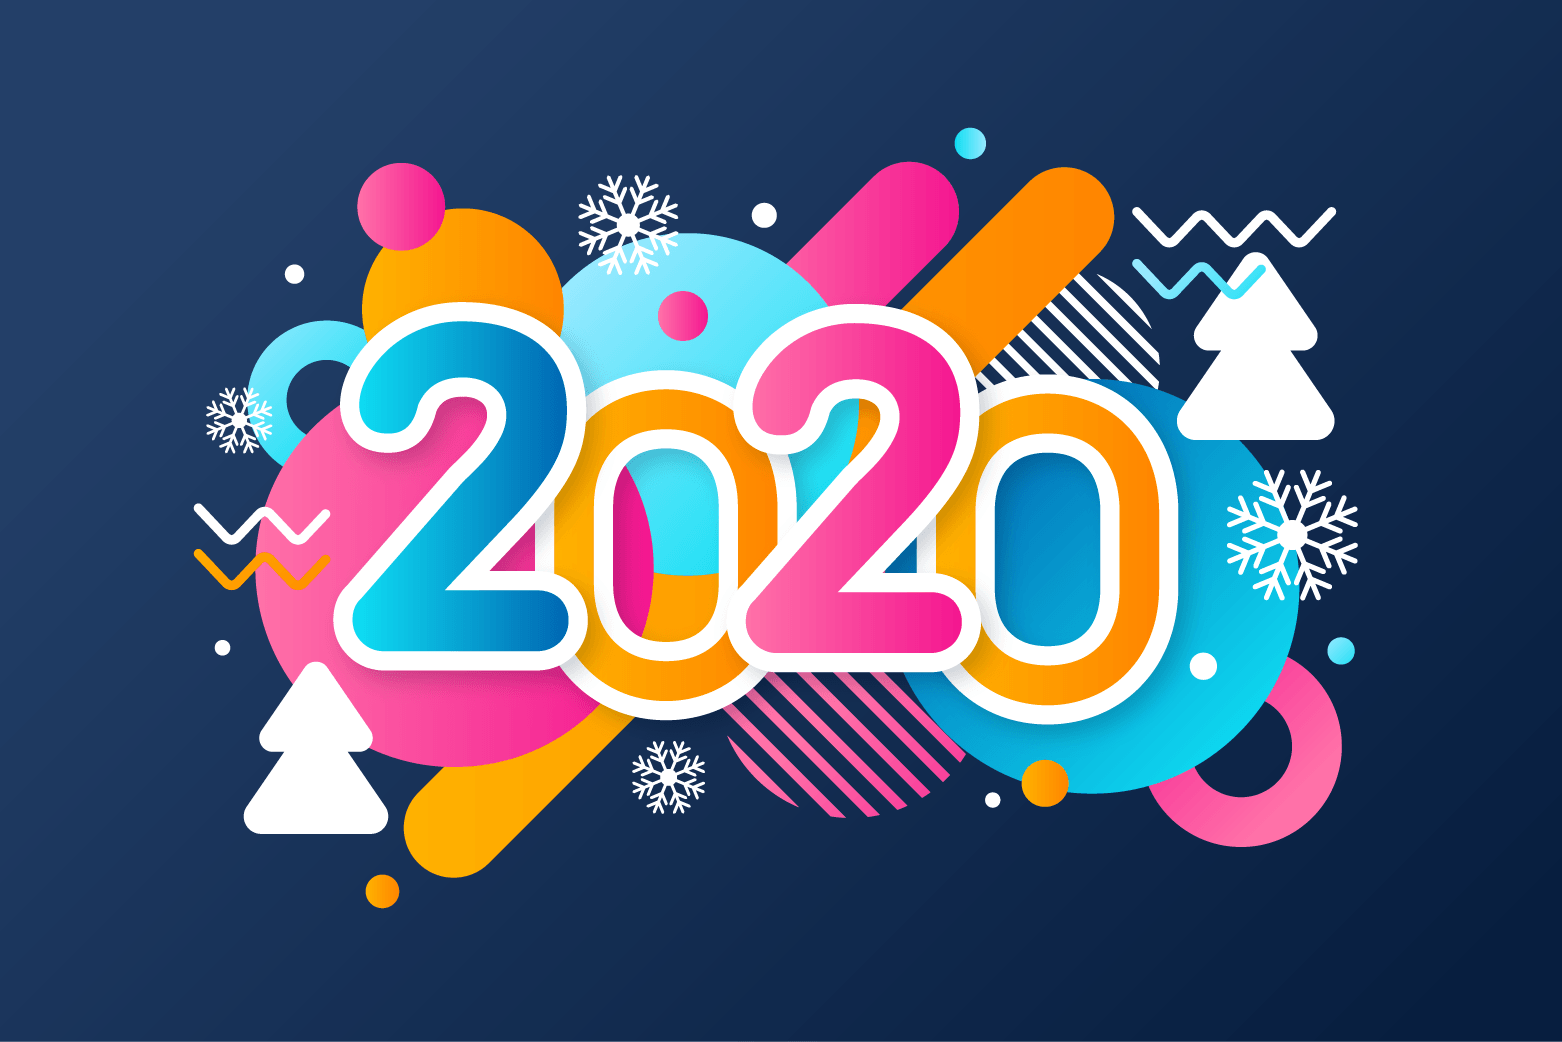 2020voeux